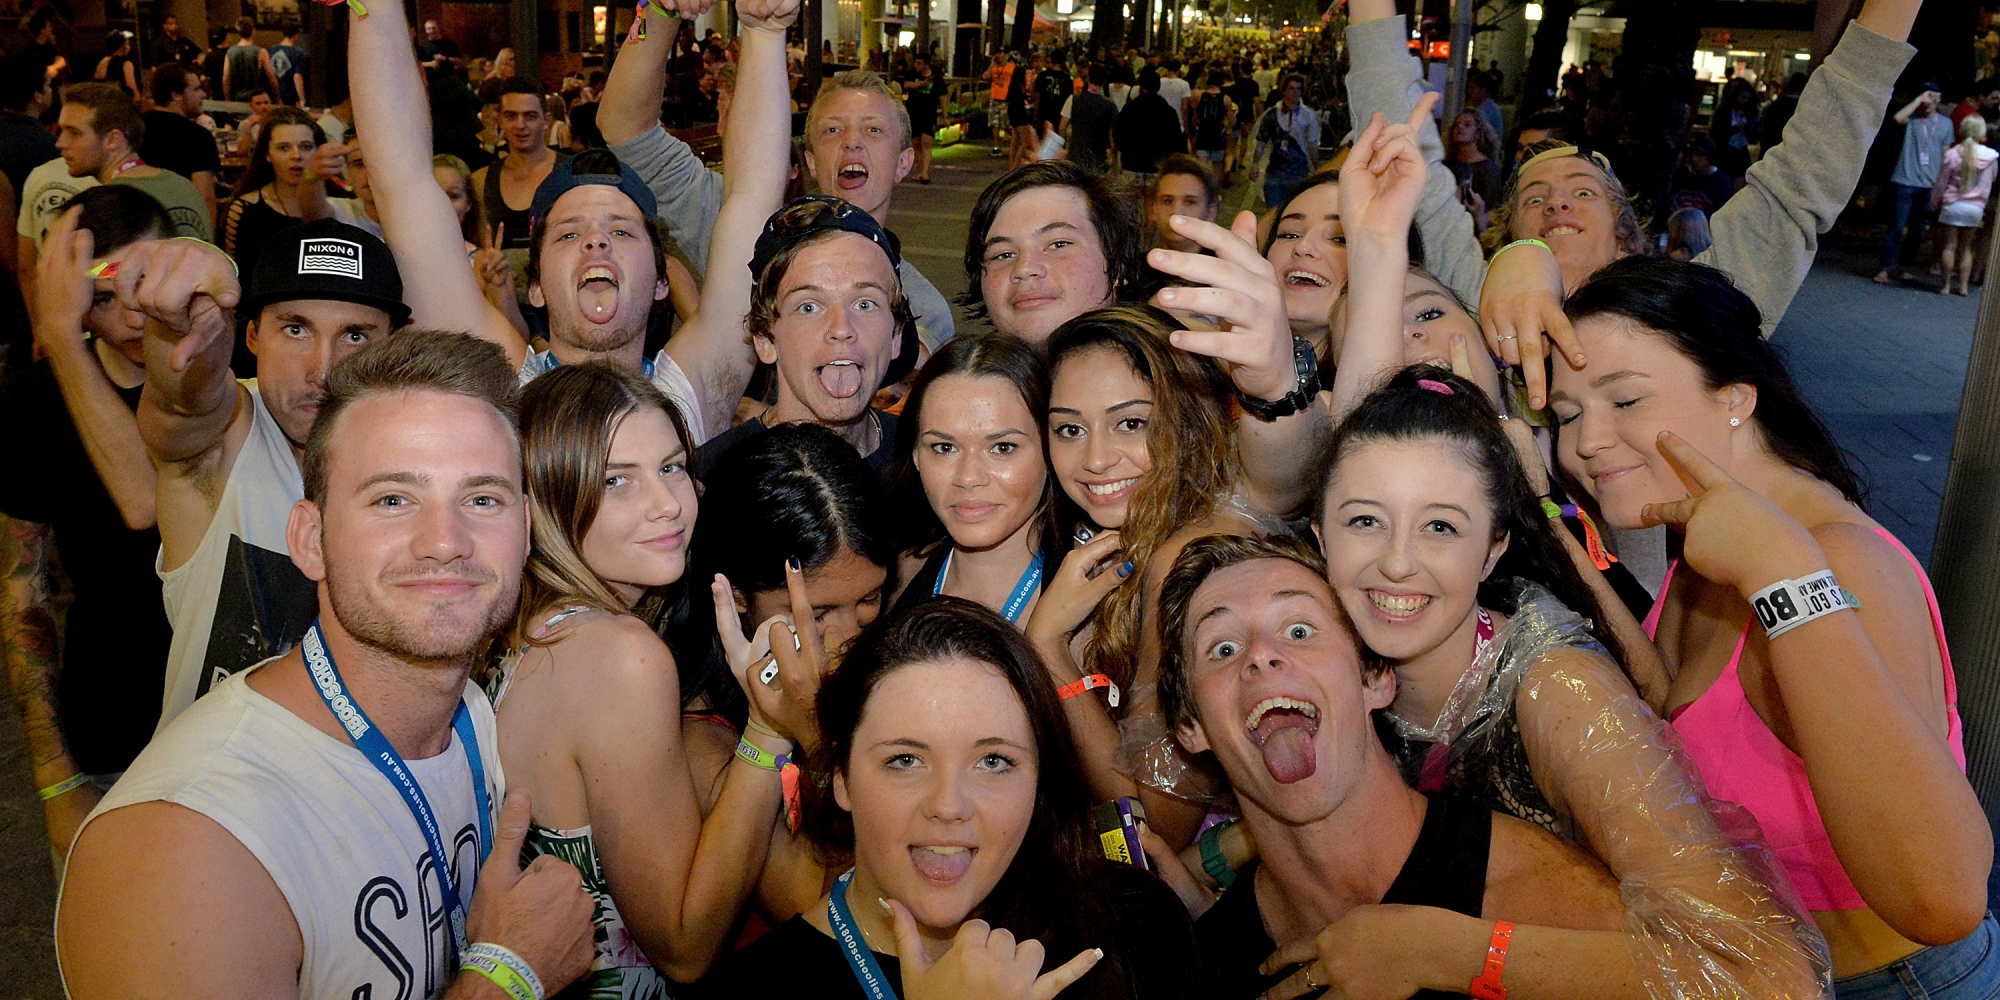 Police Blitz Opening Night At Gold Coast Schoolies